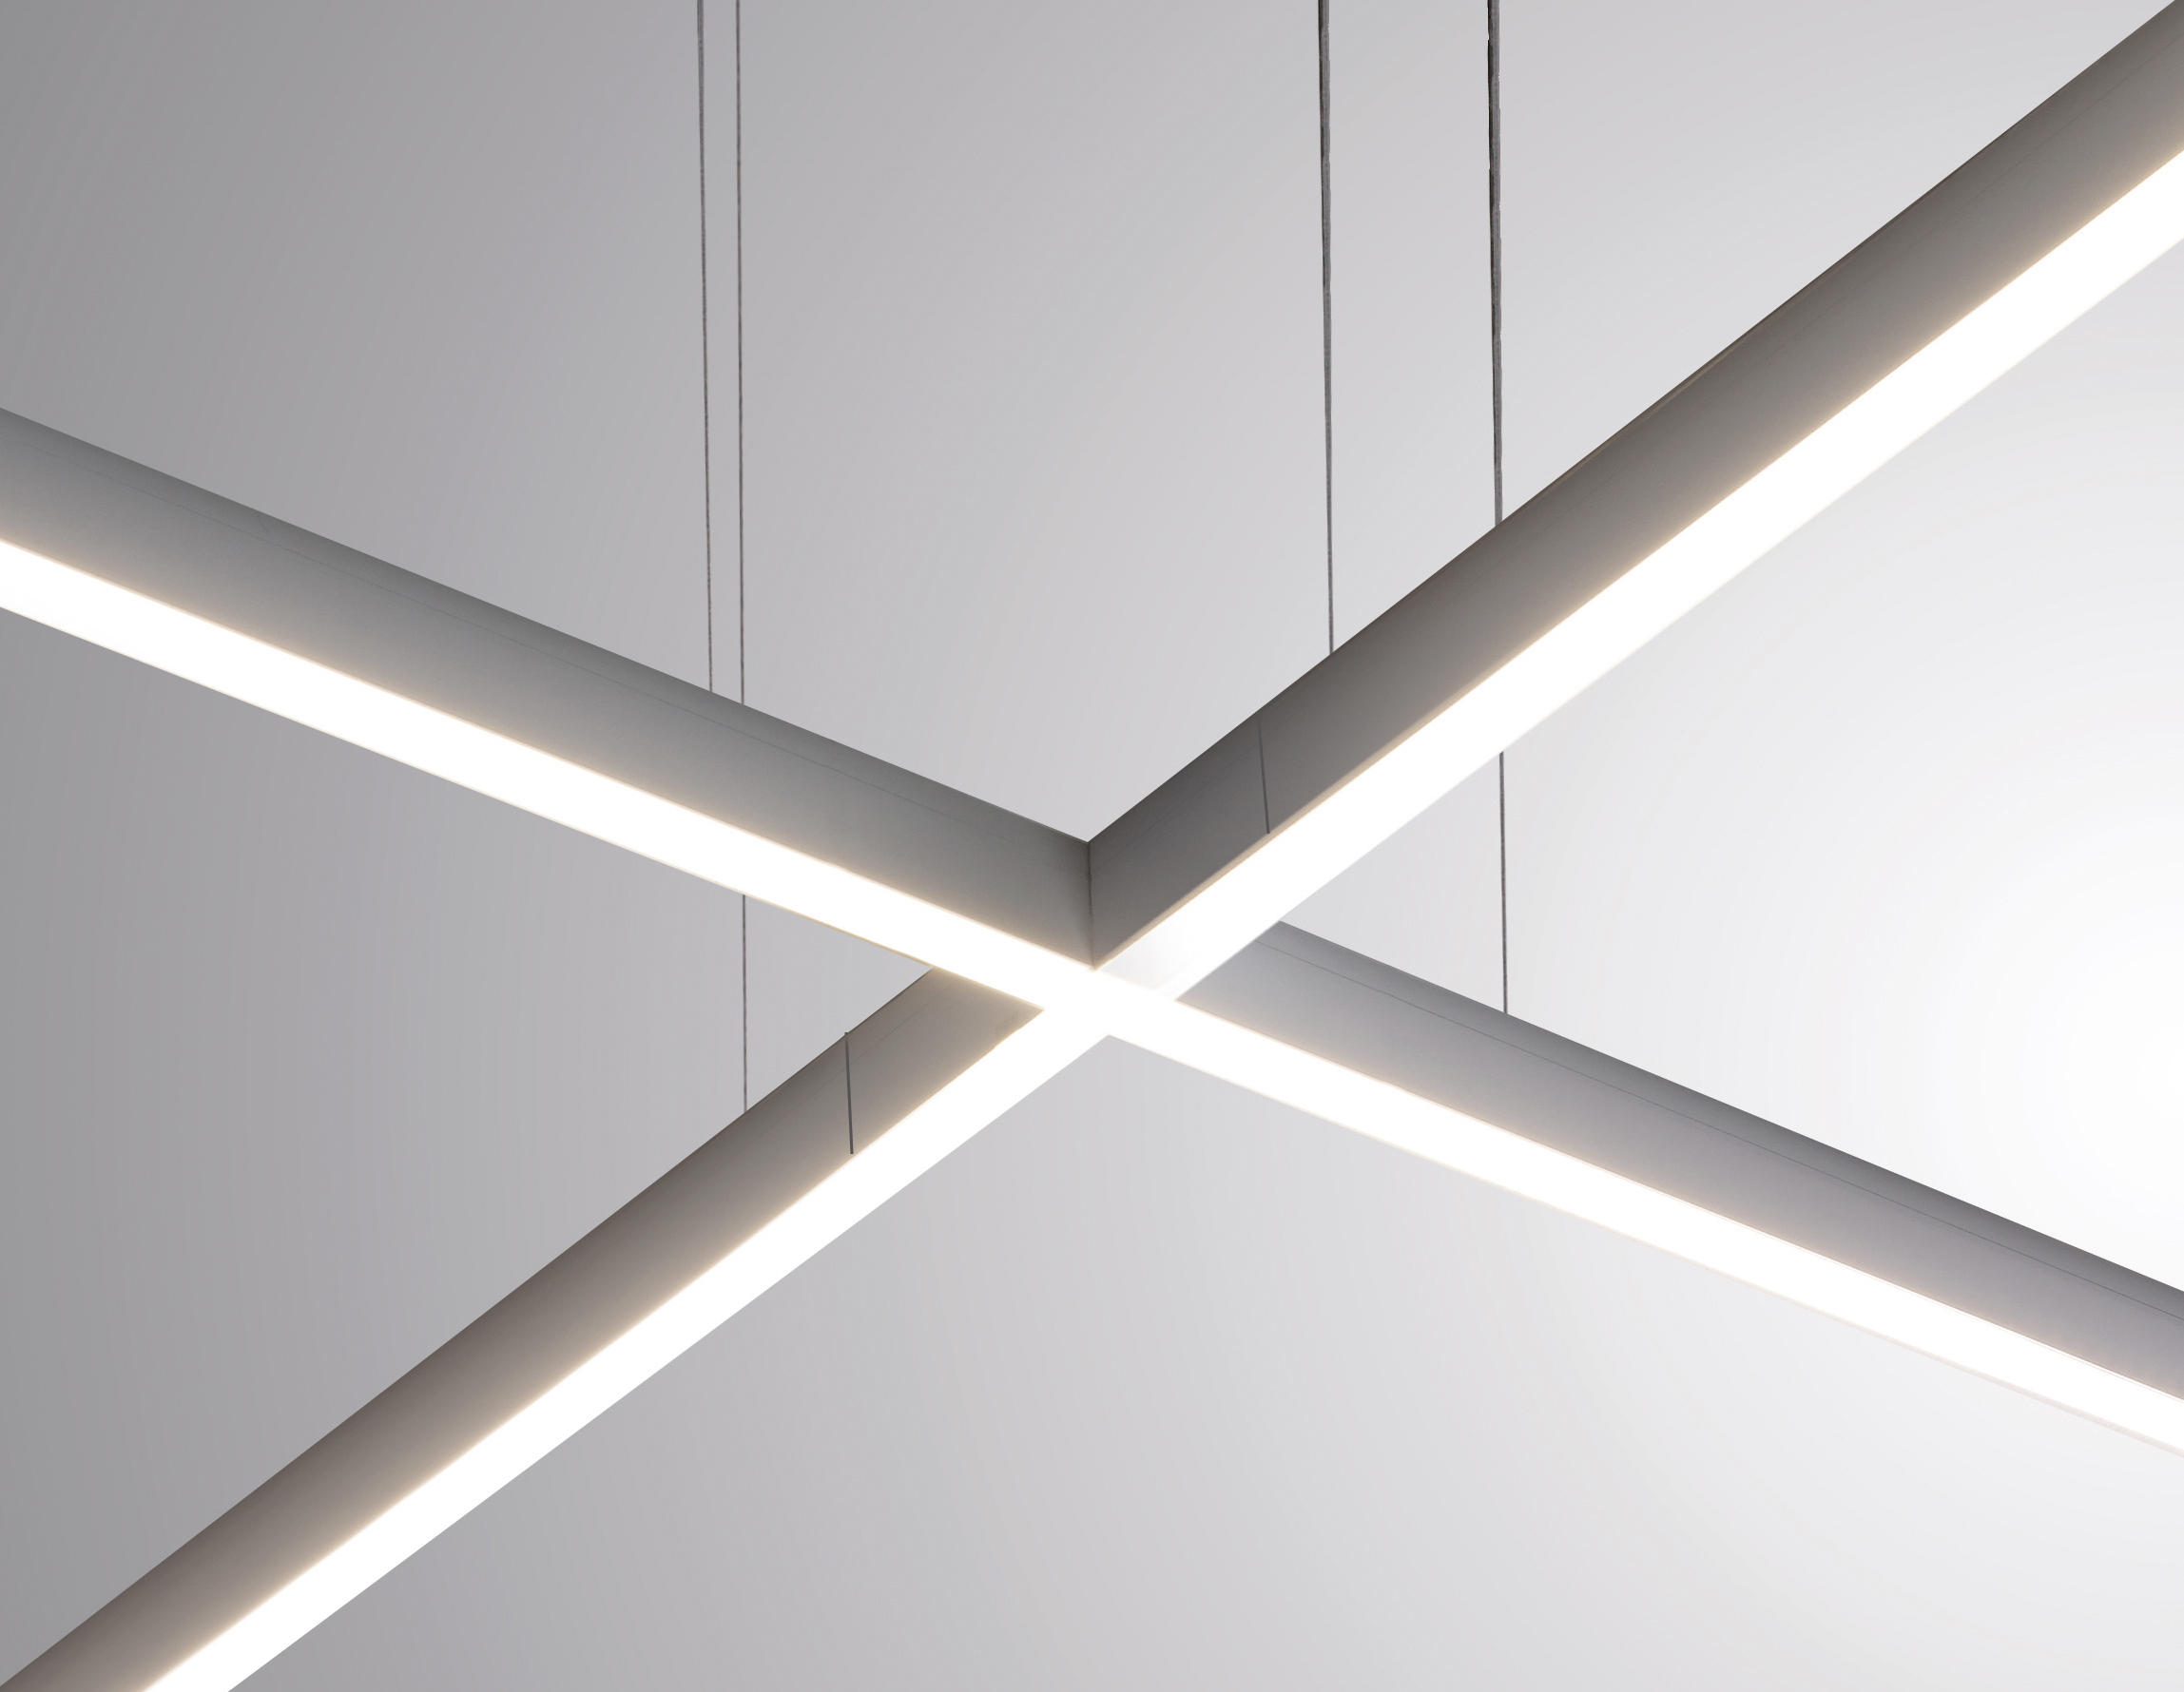 Rail sistema lampade sospensione egoluce architonic